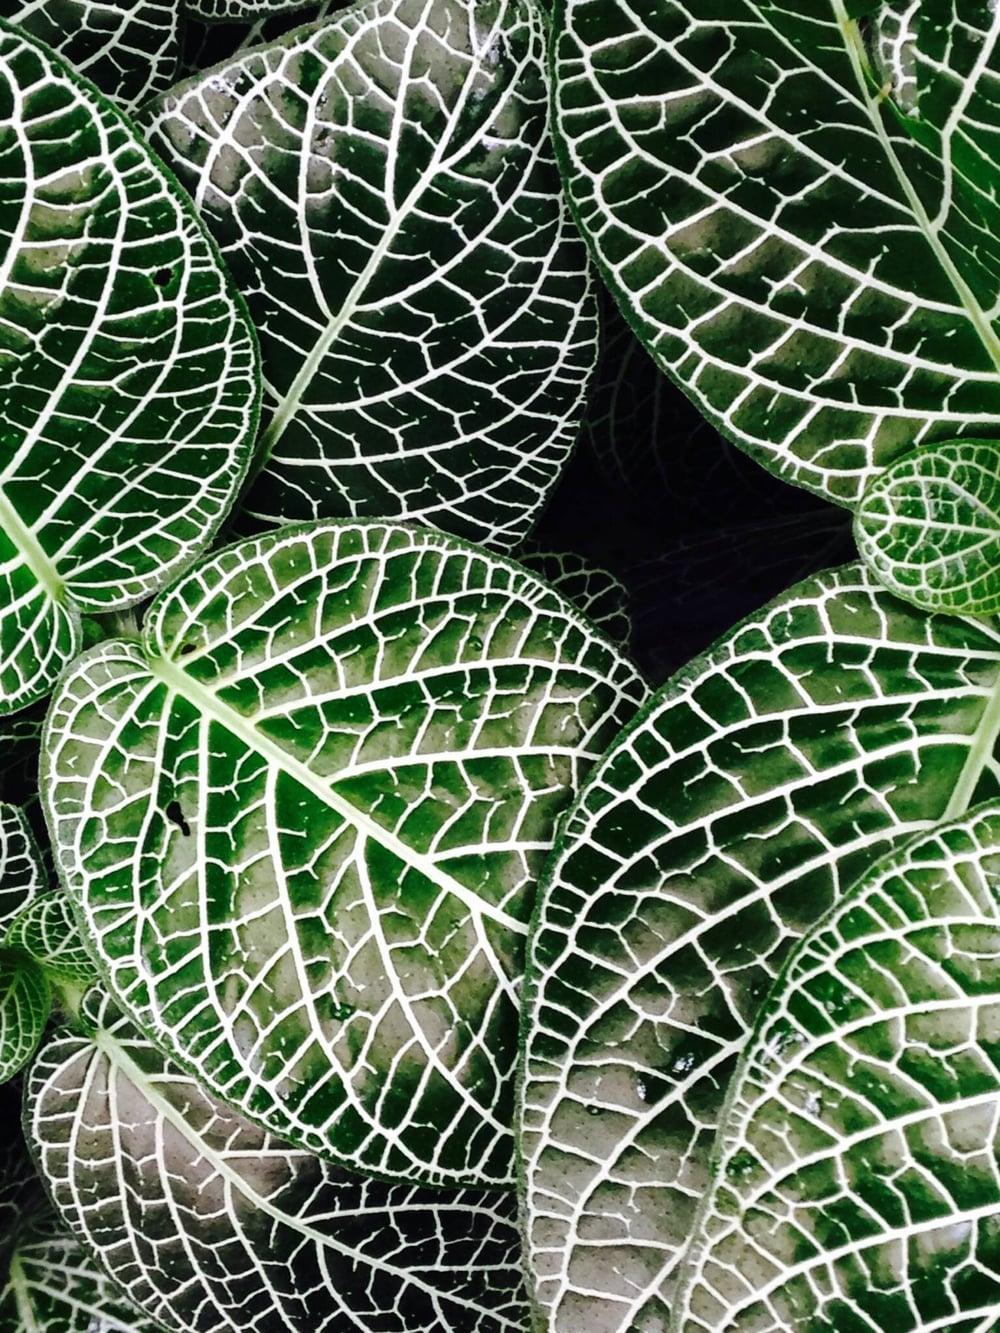 Speckled leaves.JPG